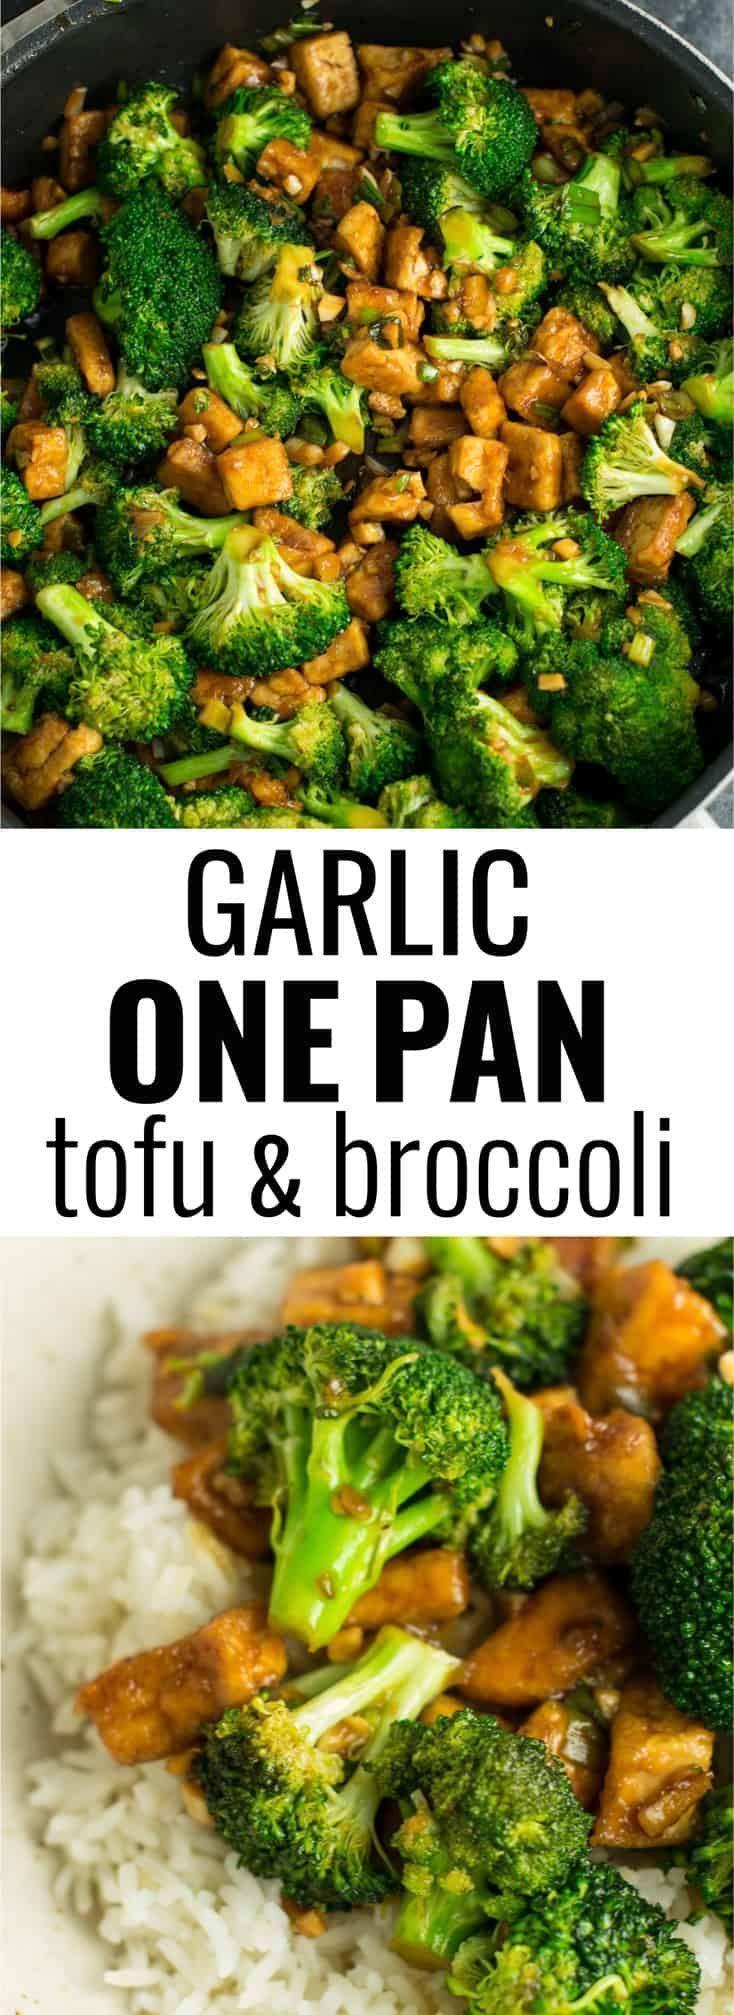 Garlic tofu broccoli skillet recipe made in just one pan. A healthy alternative